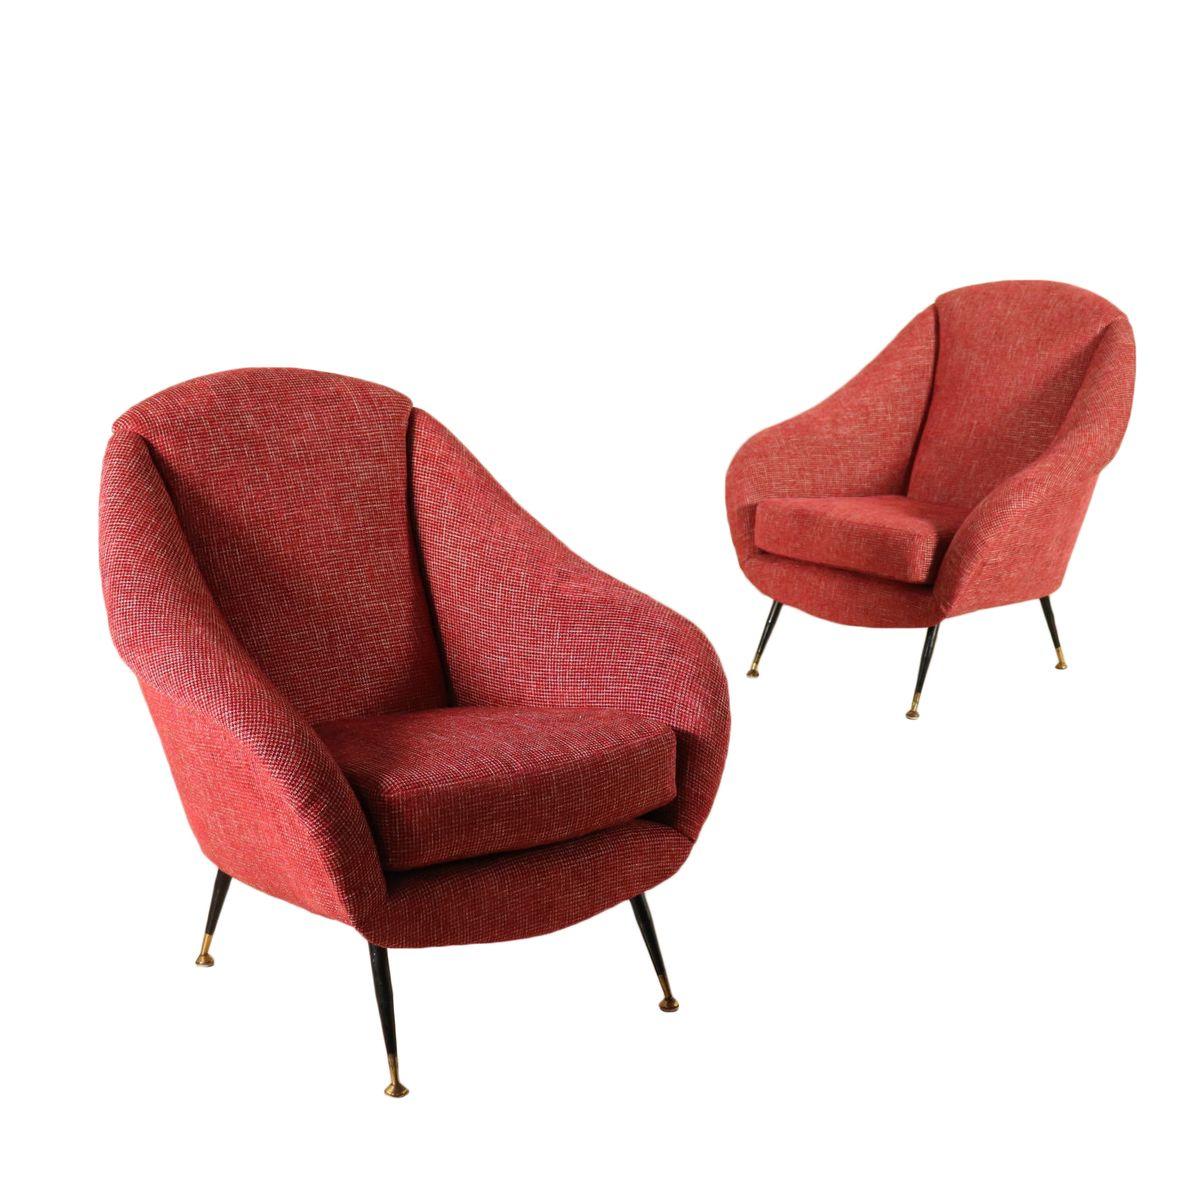 Italienische Sessel aus Stoff, Metall & Messing, 1960er, 2er Set